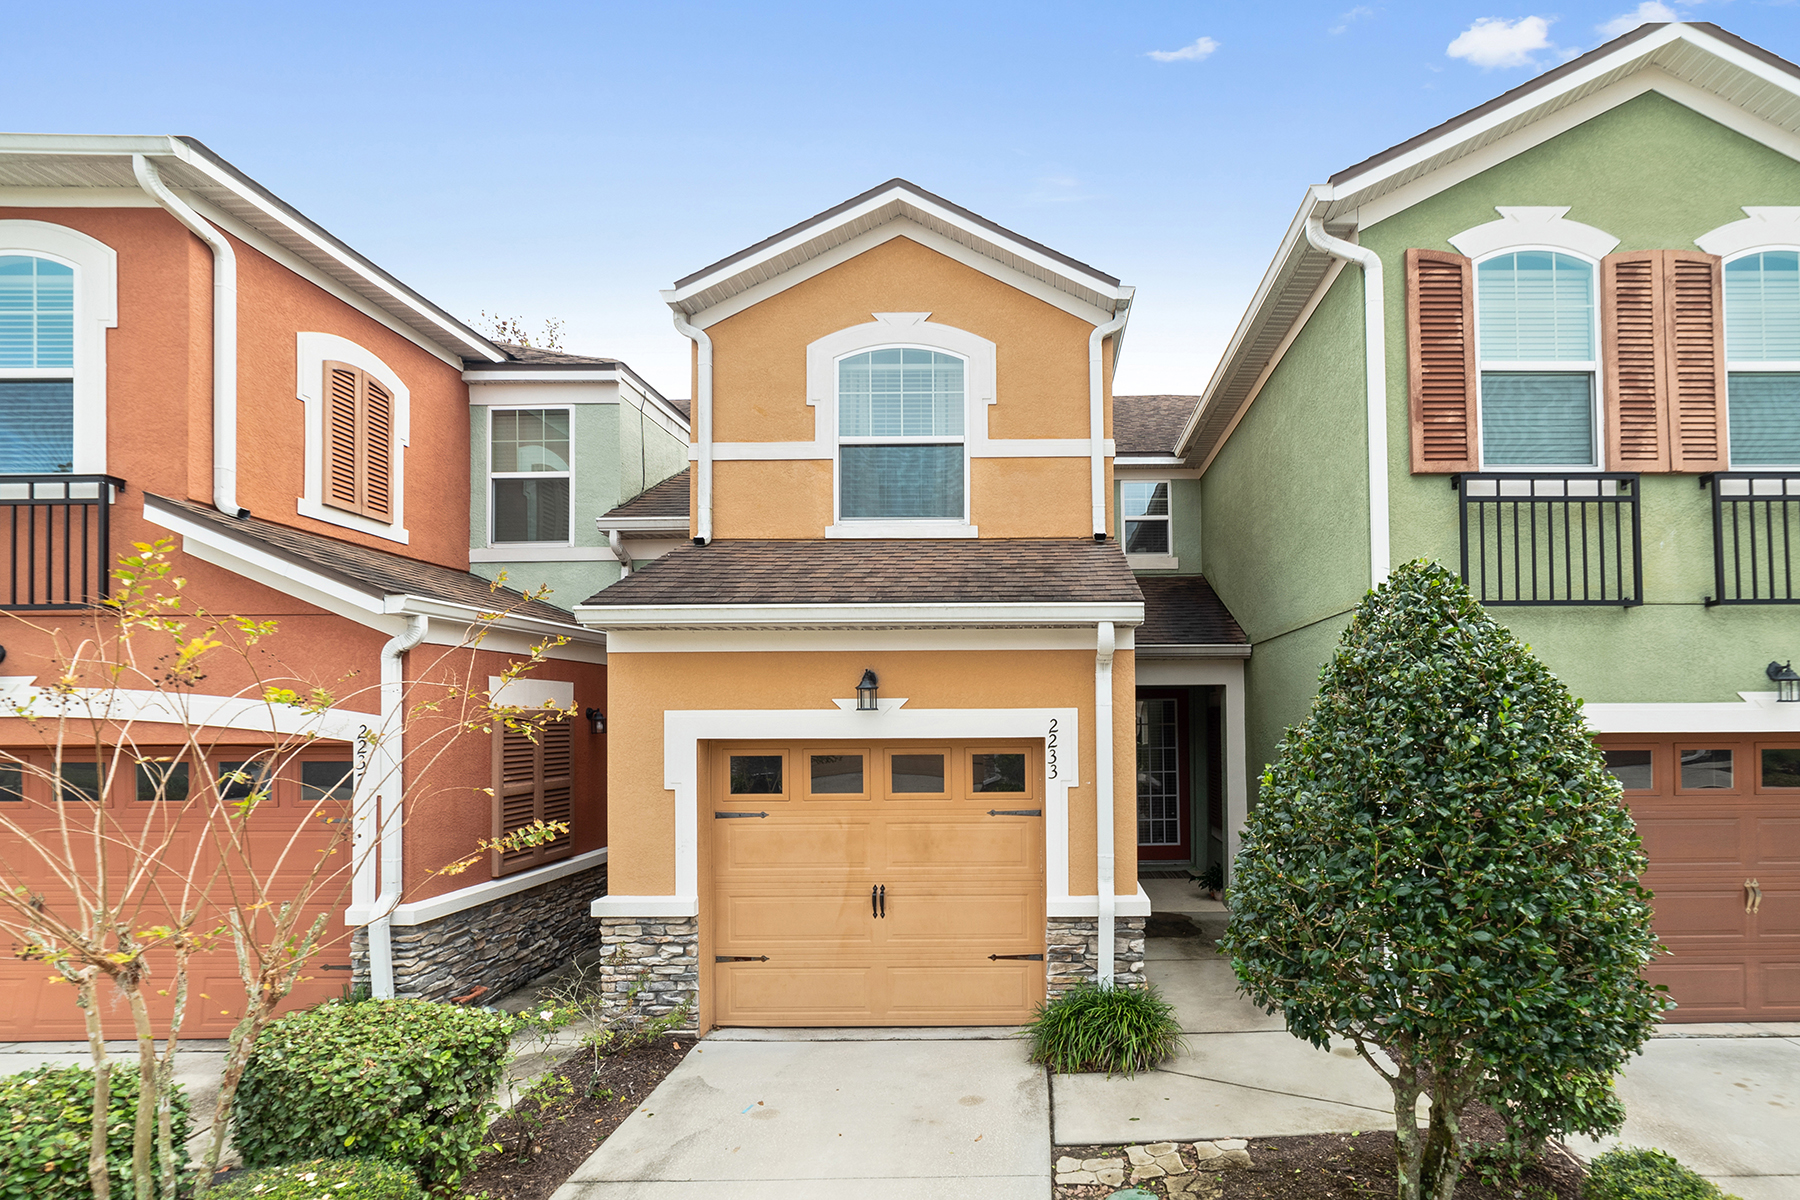 townhouses for Sale at SANFORD 2233 Brookridge Trl Sanford, Florida 32773 United States